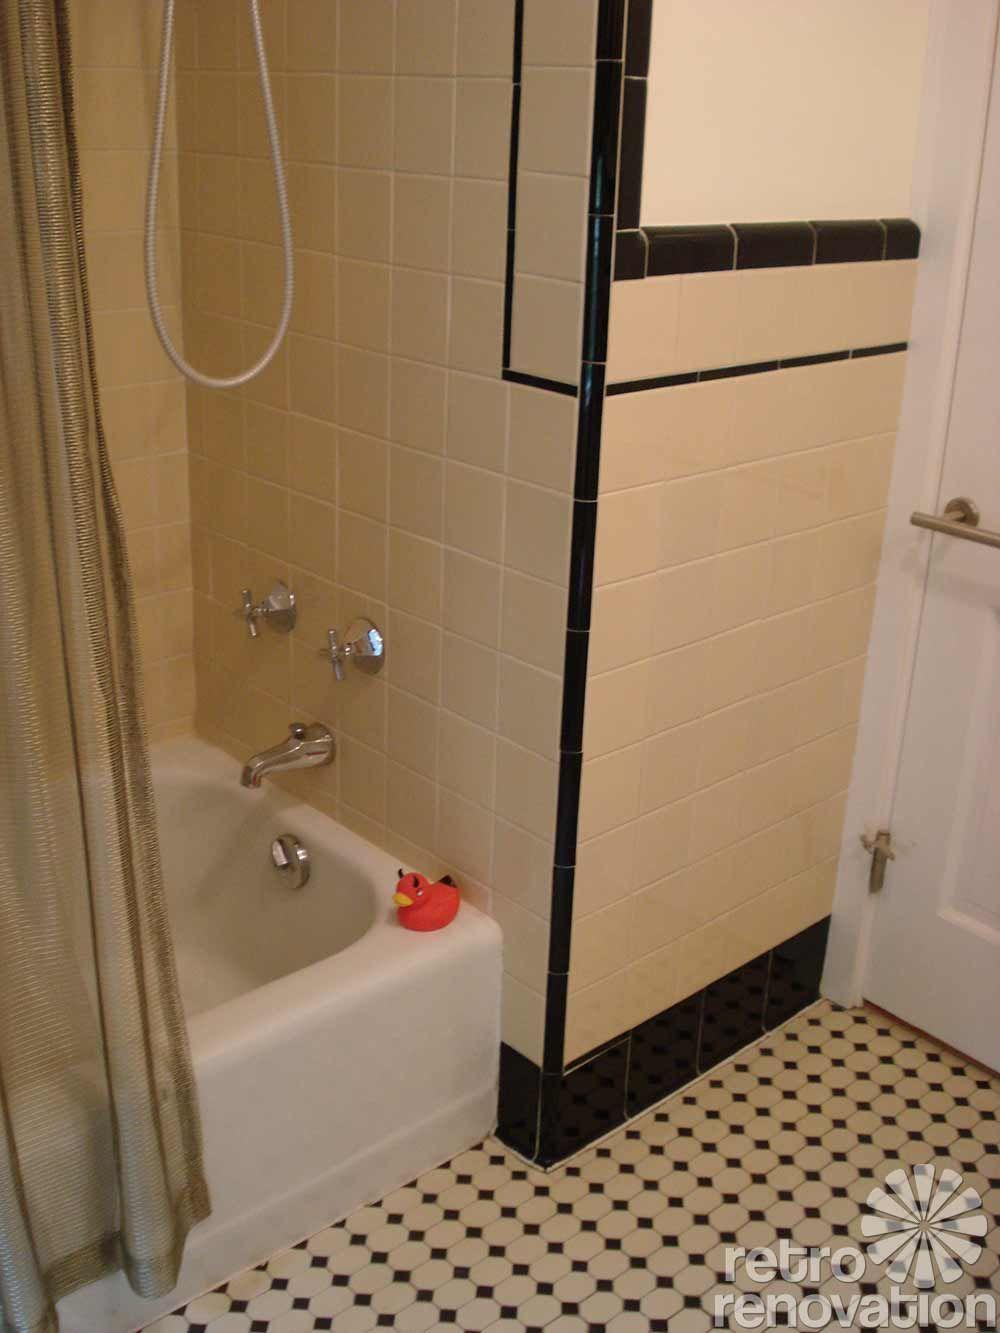 Bird Ernie S 1948 Yellow And Black Tile Vintage Bathroom Tile